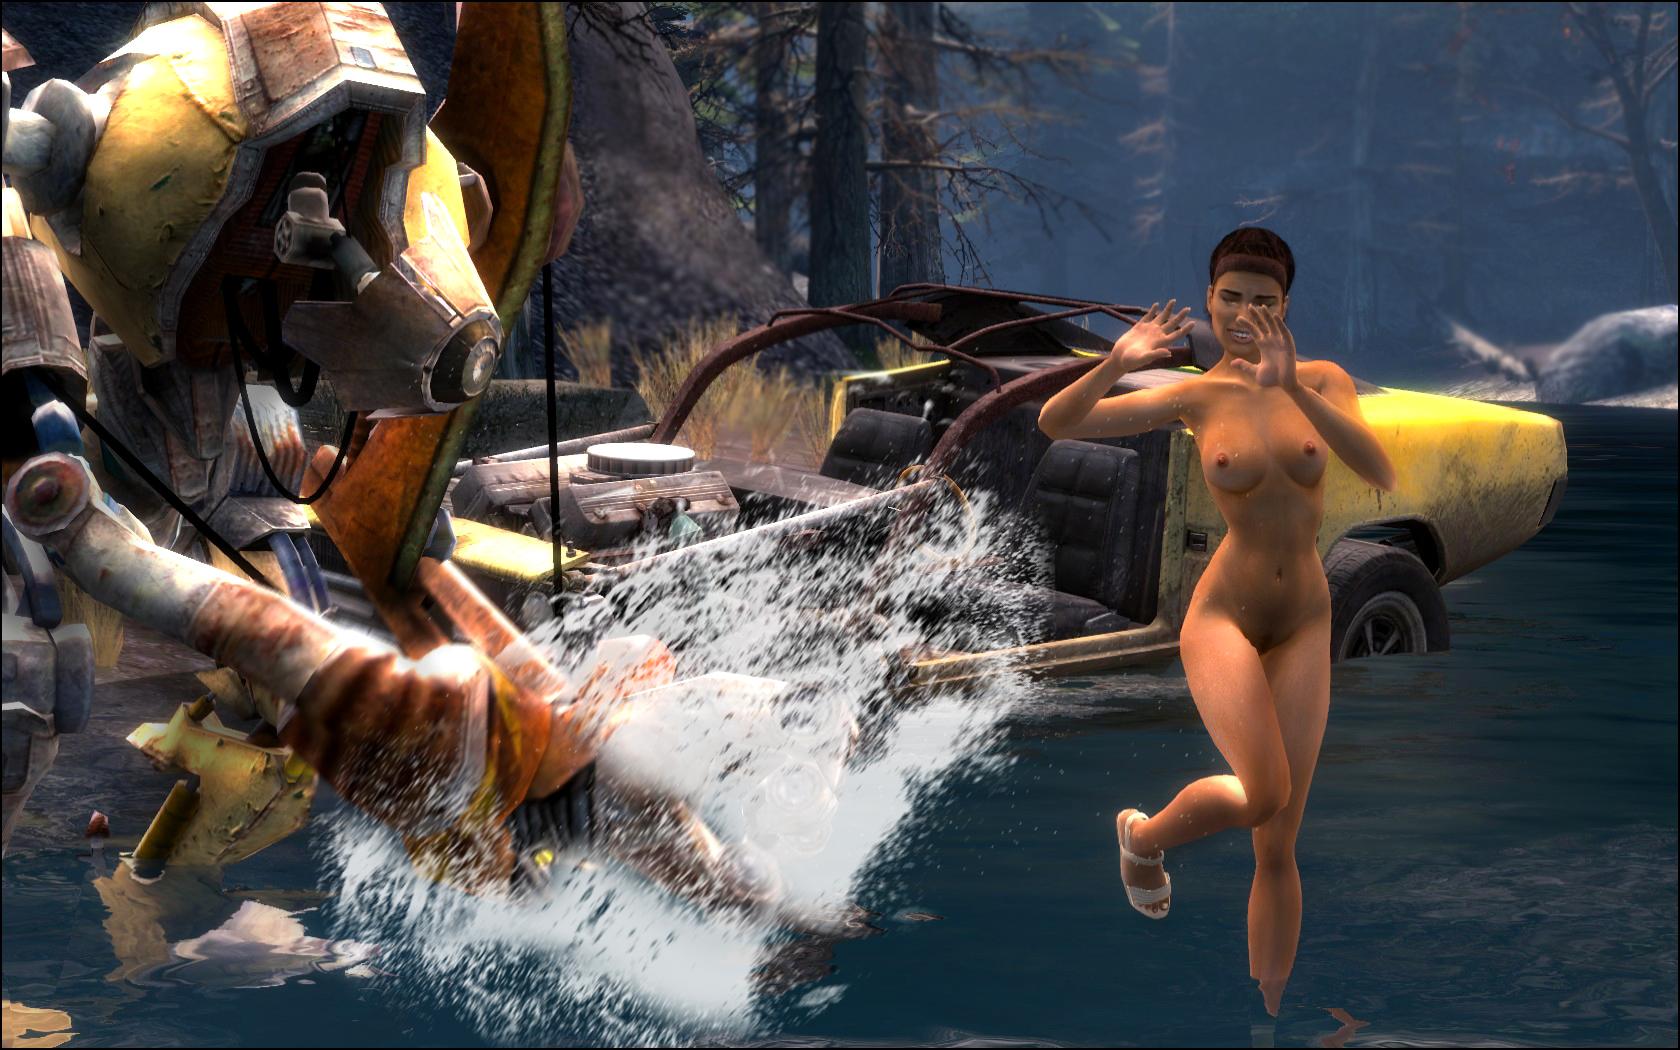 wild life willa's Skyrim aela the huntress nude